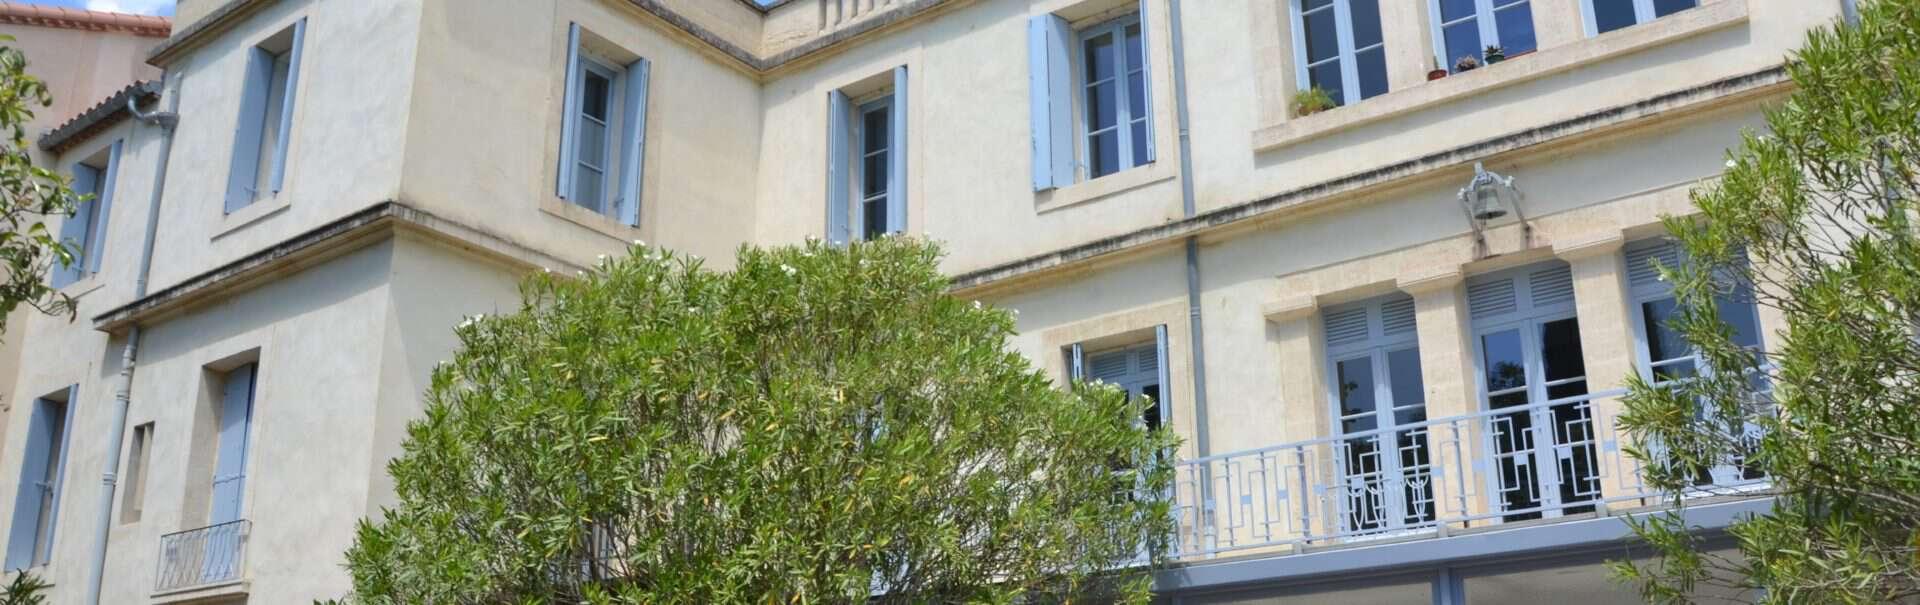 Villa_Savine.jpg